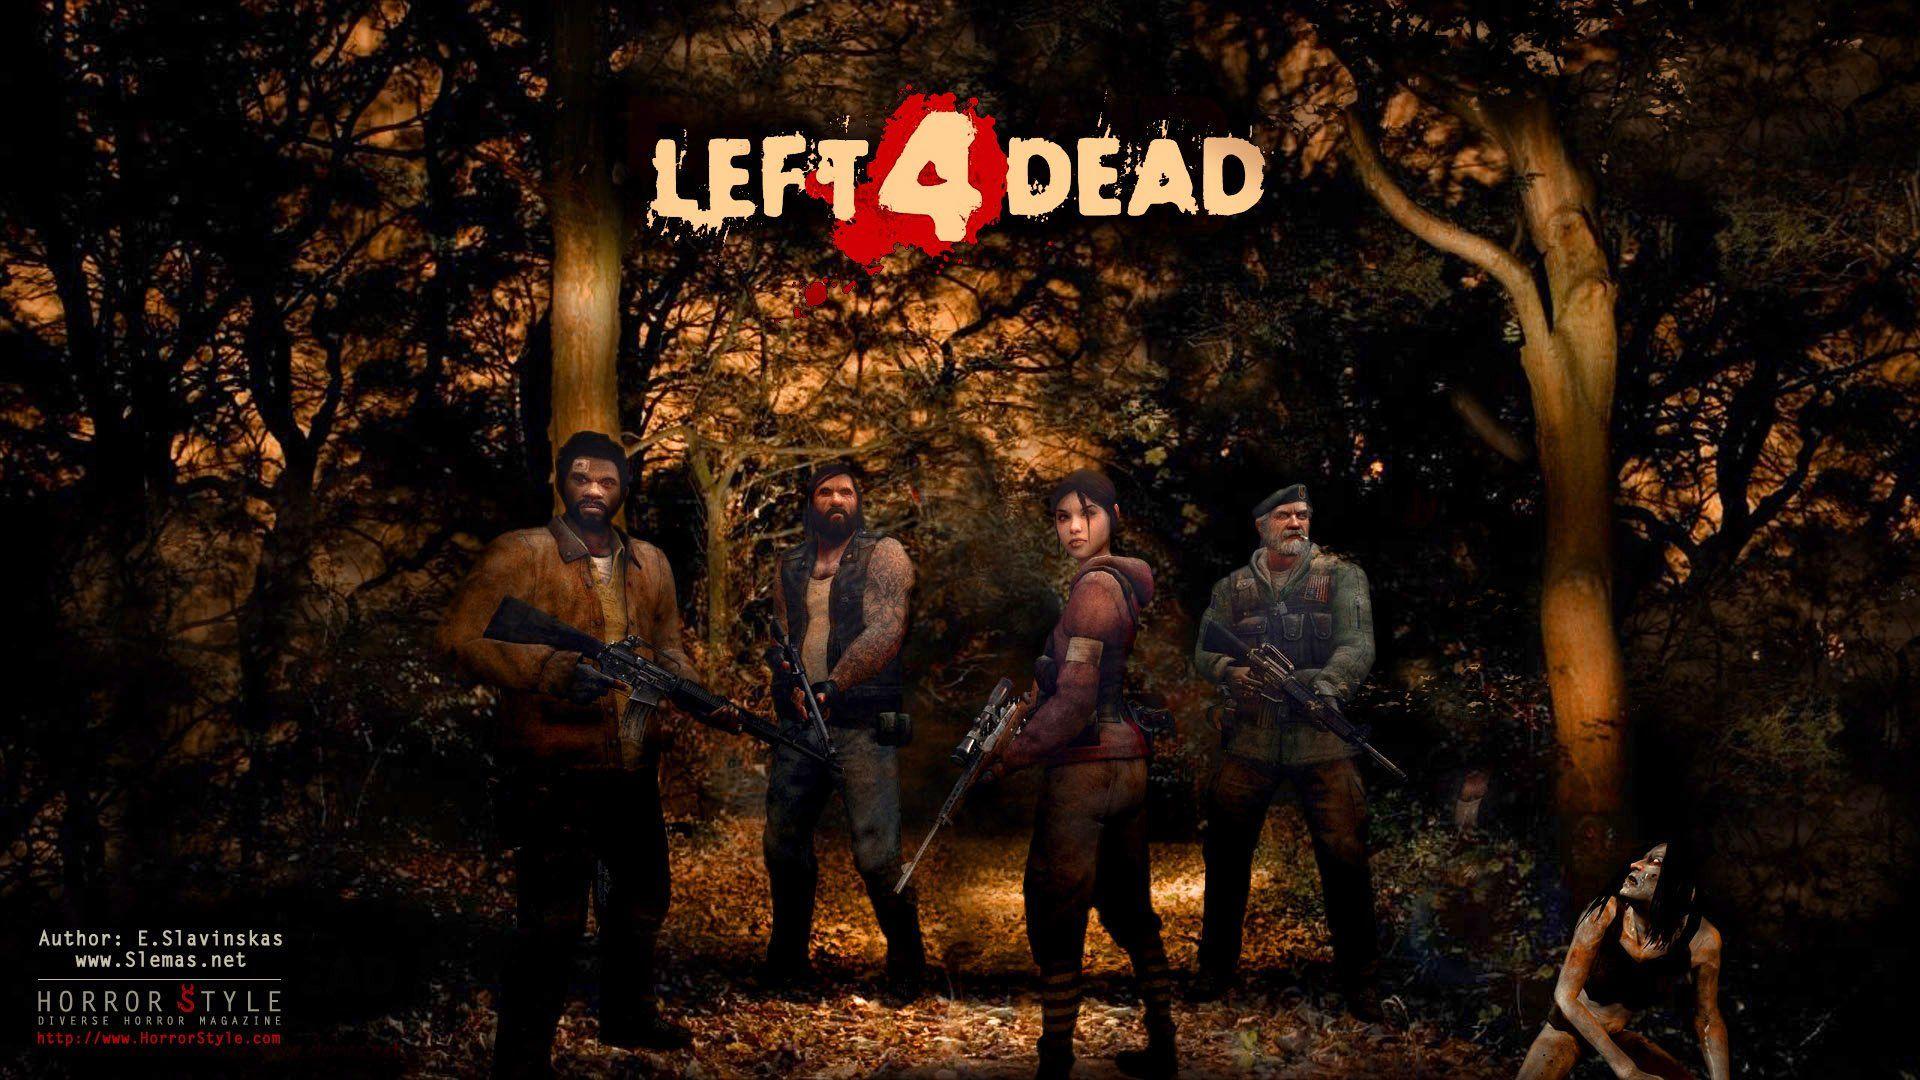 Aniversario Left 4 Dead